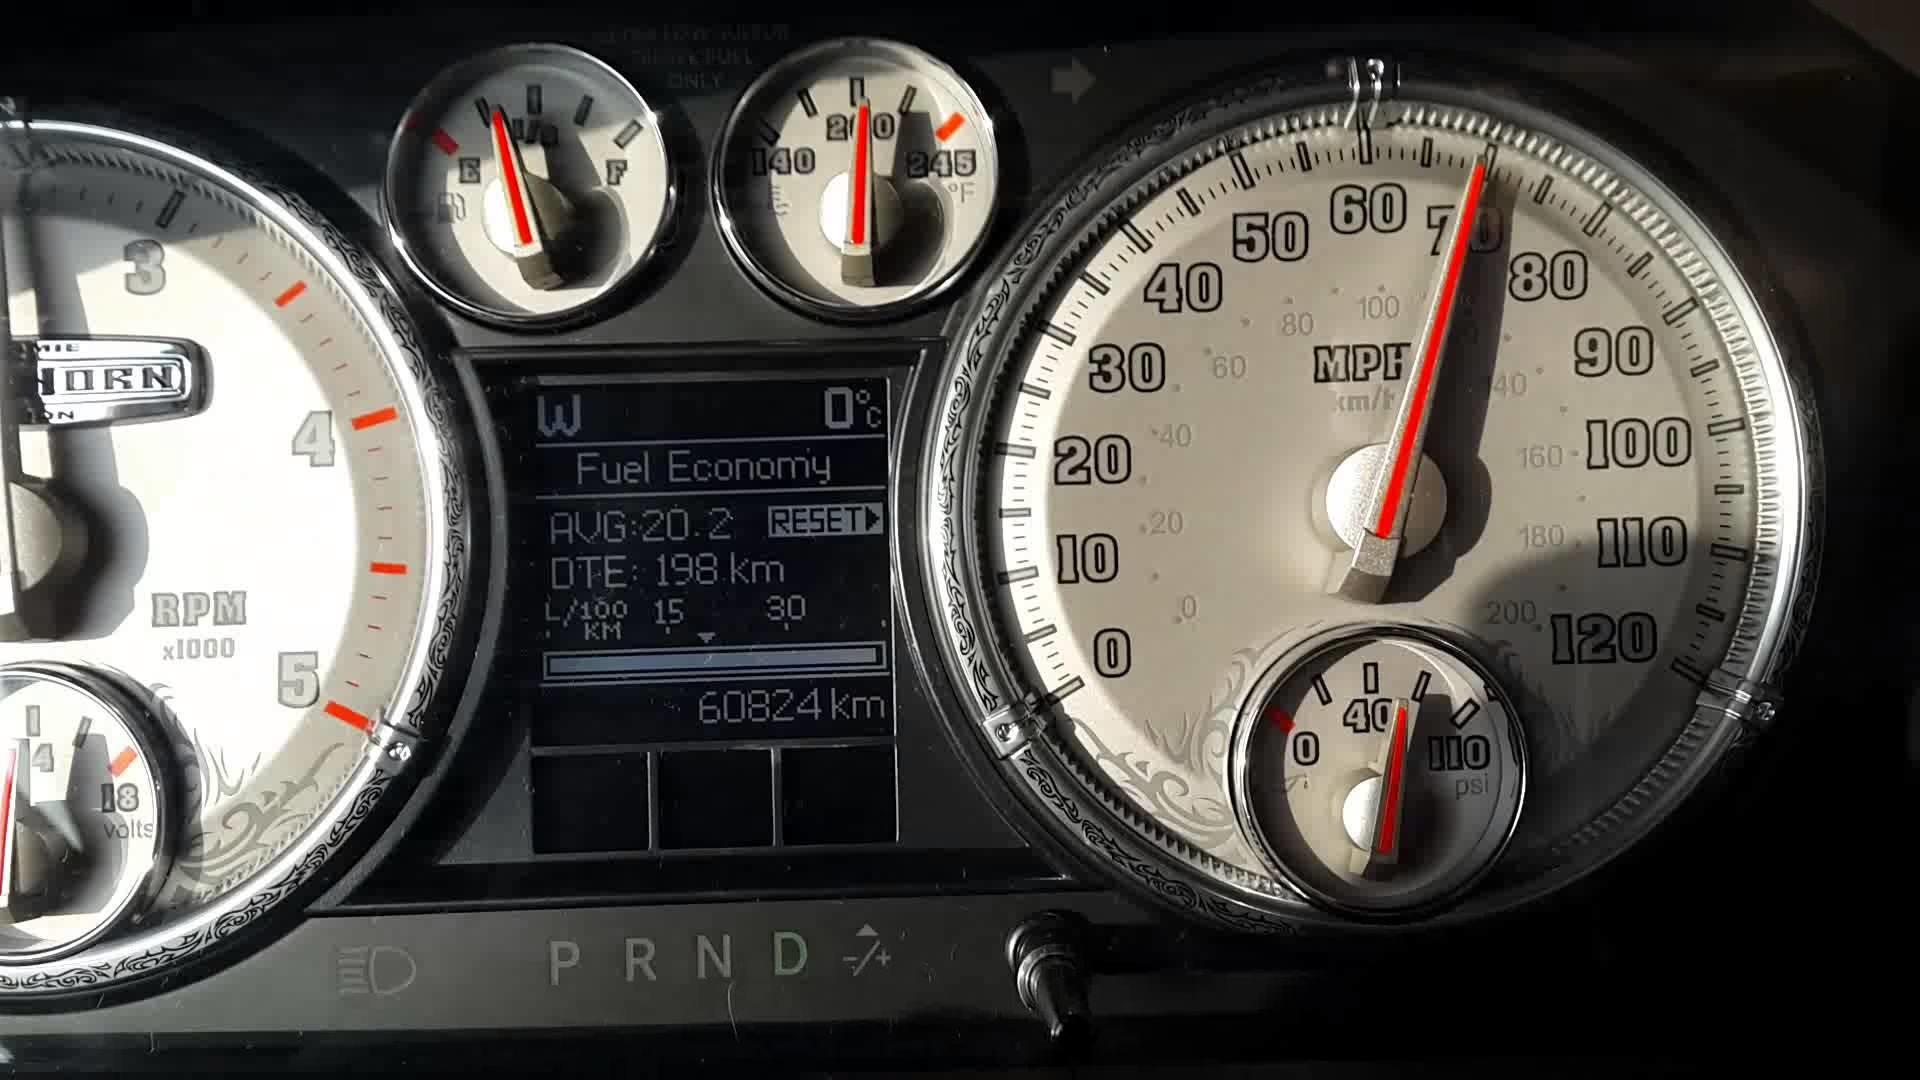 Ram 2500 6.7 Cummins Smarty 0-60 Acceleration